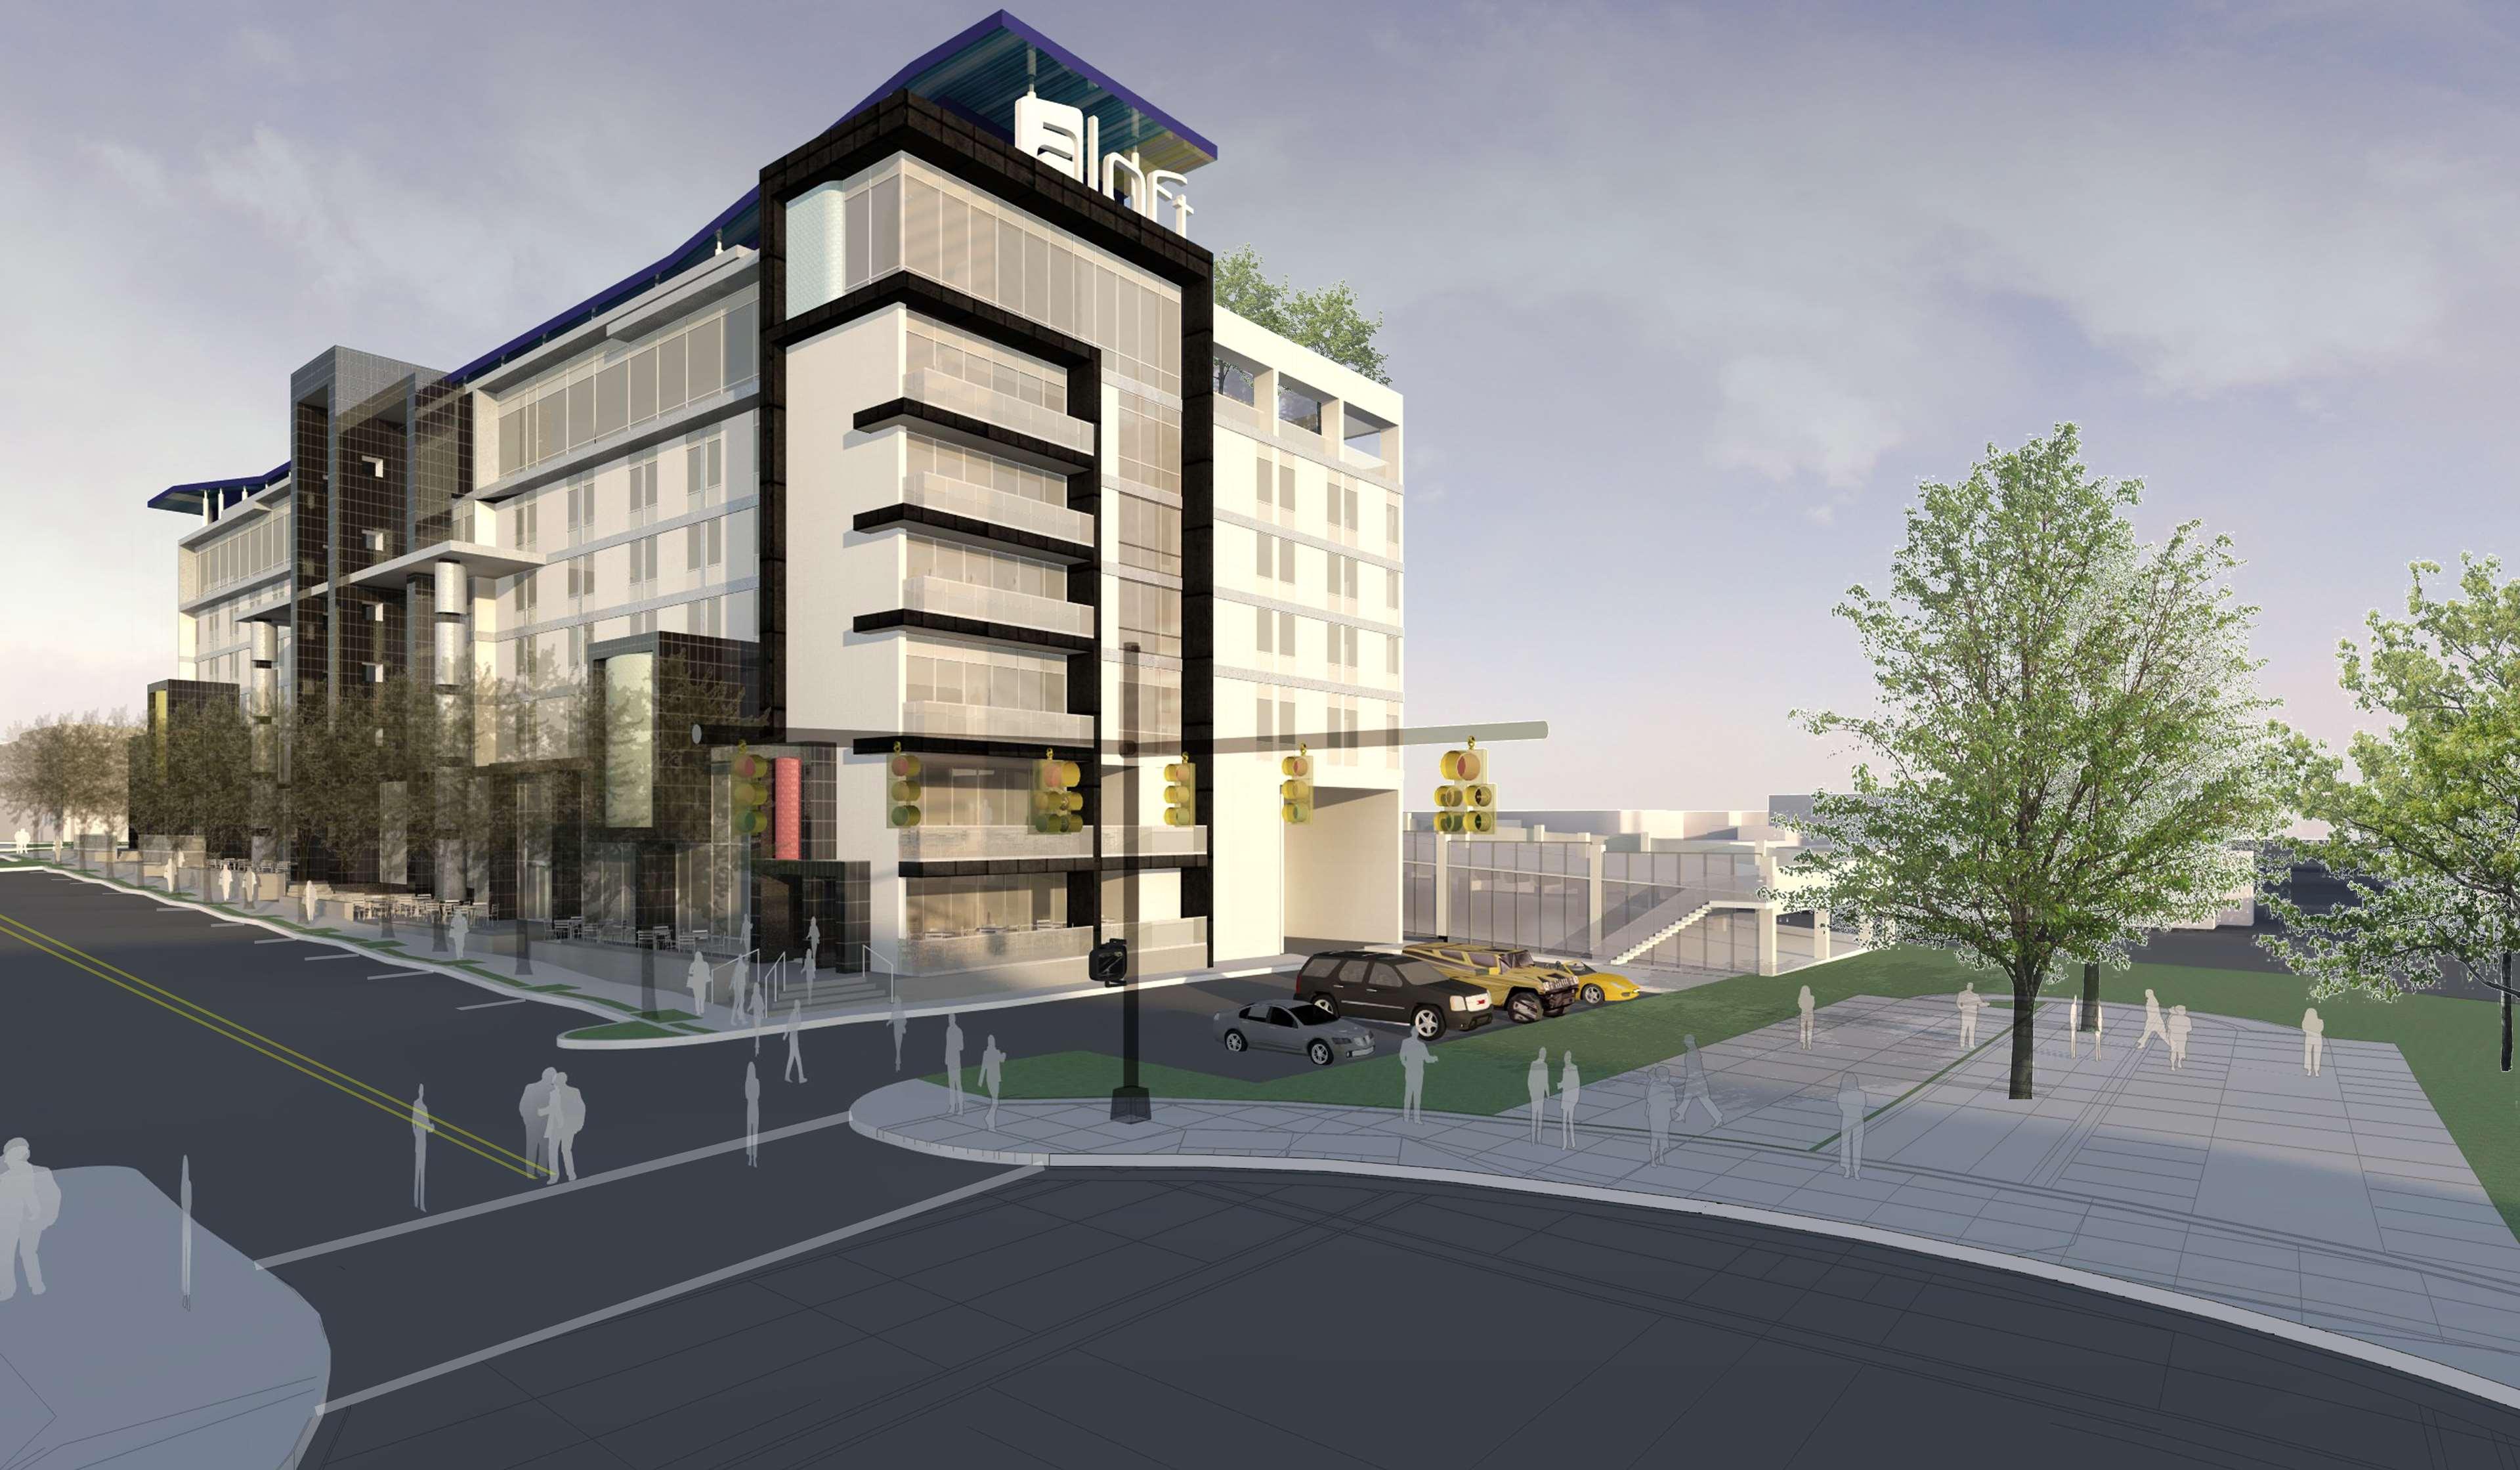 Aloft Oklahoma City Downtown - Bricktown image 1